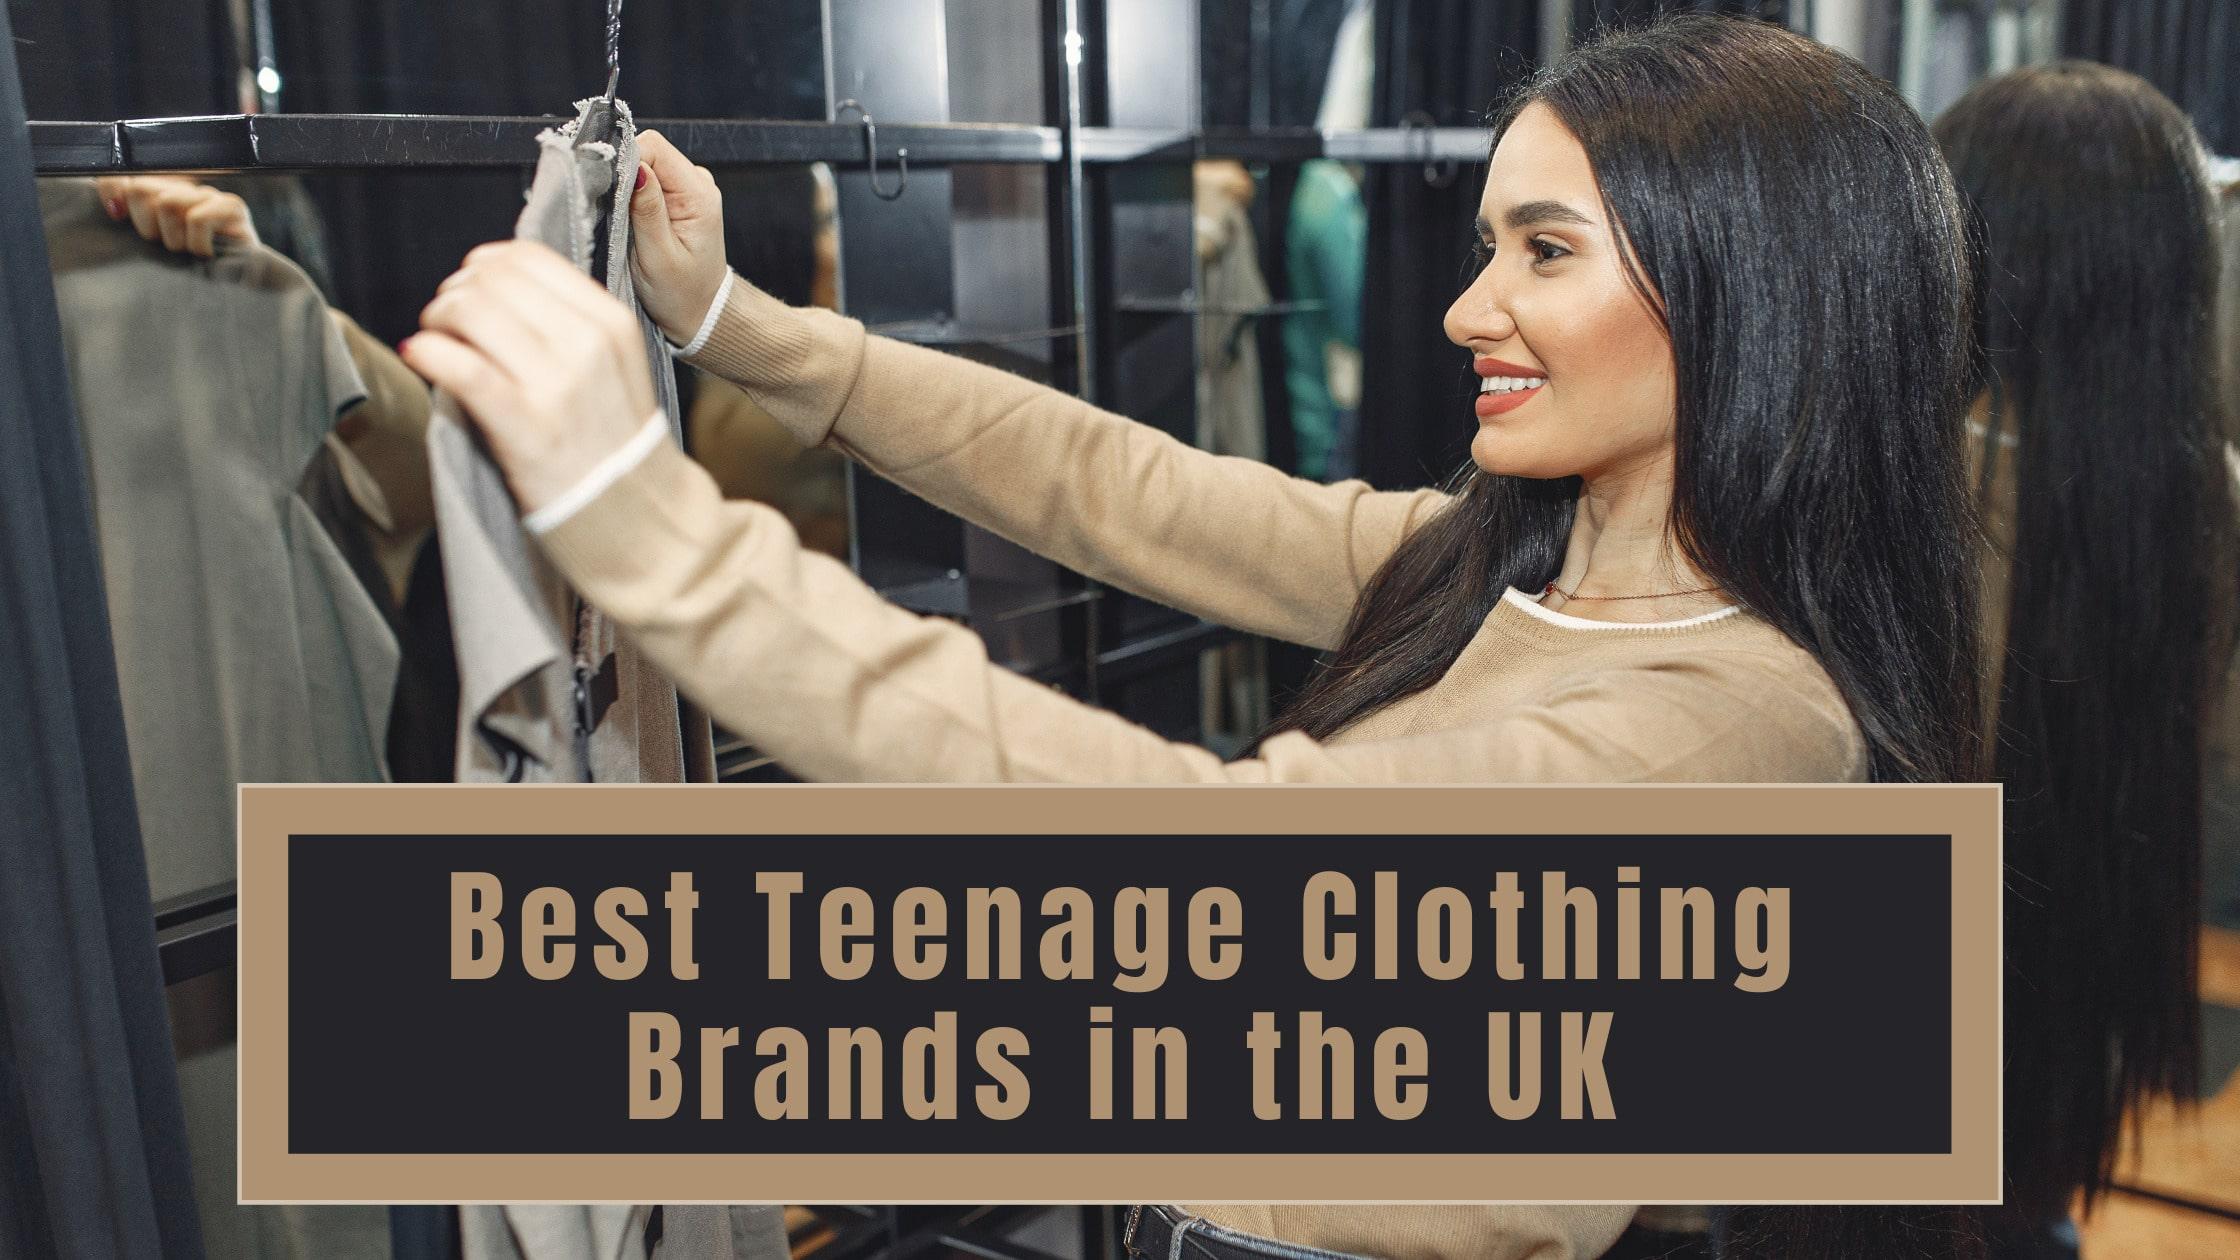 Best Teenage Clothing Brands in the UK